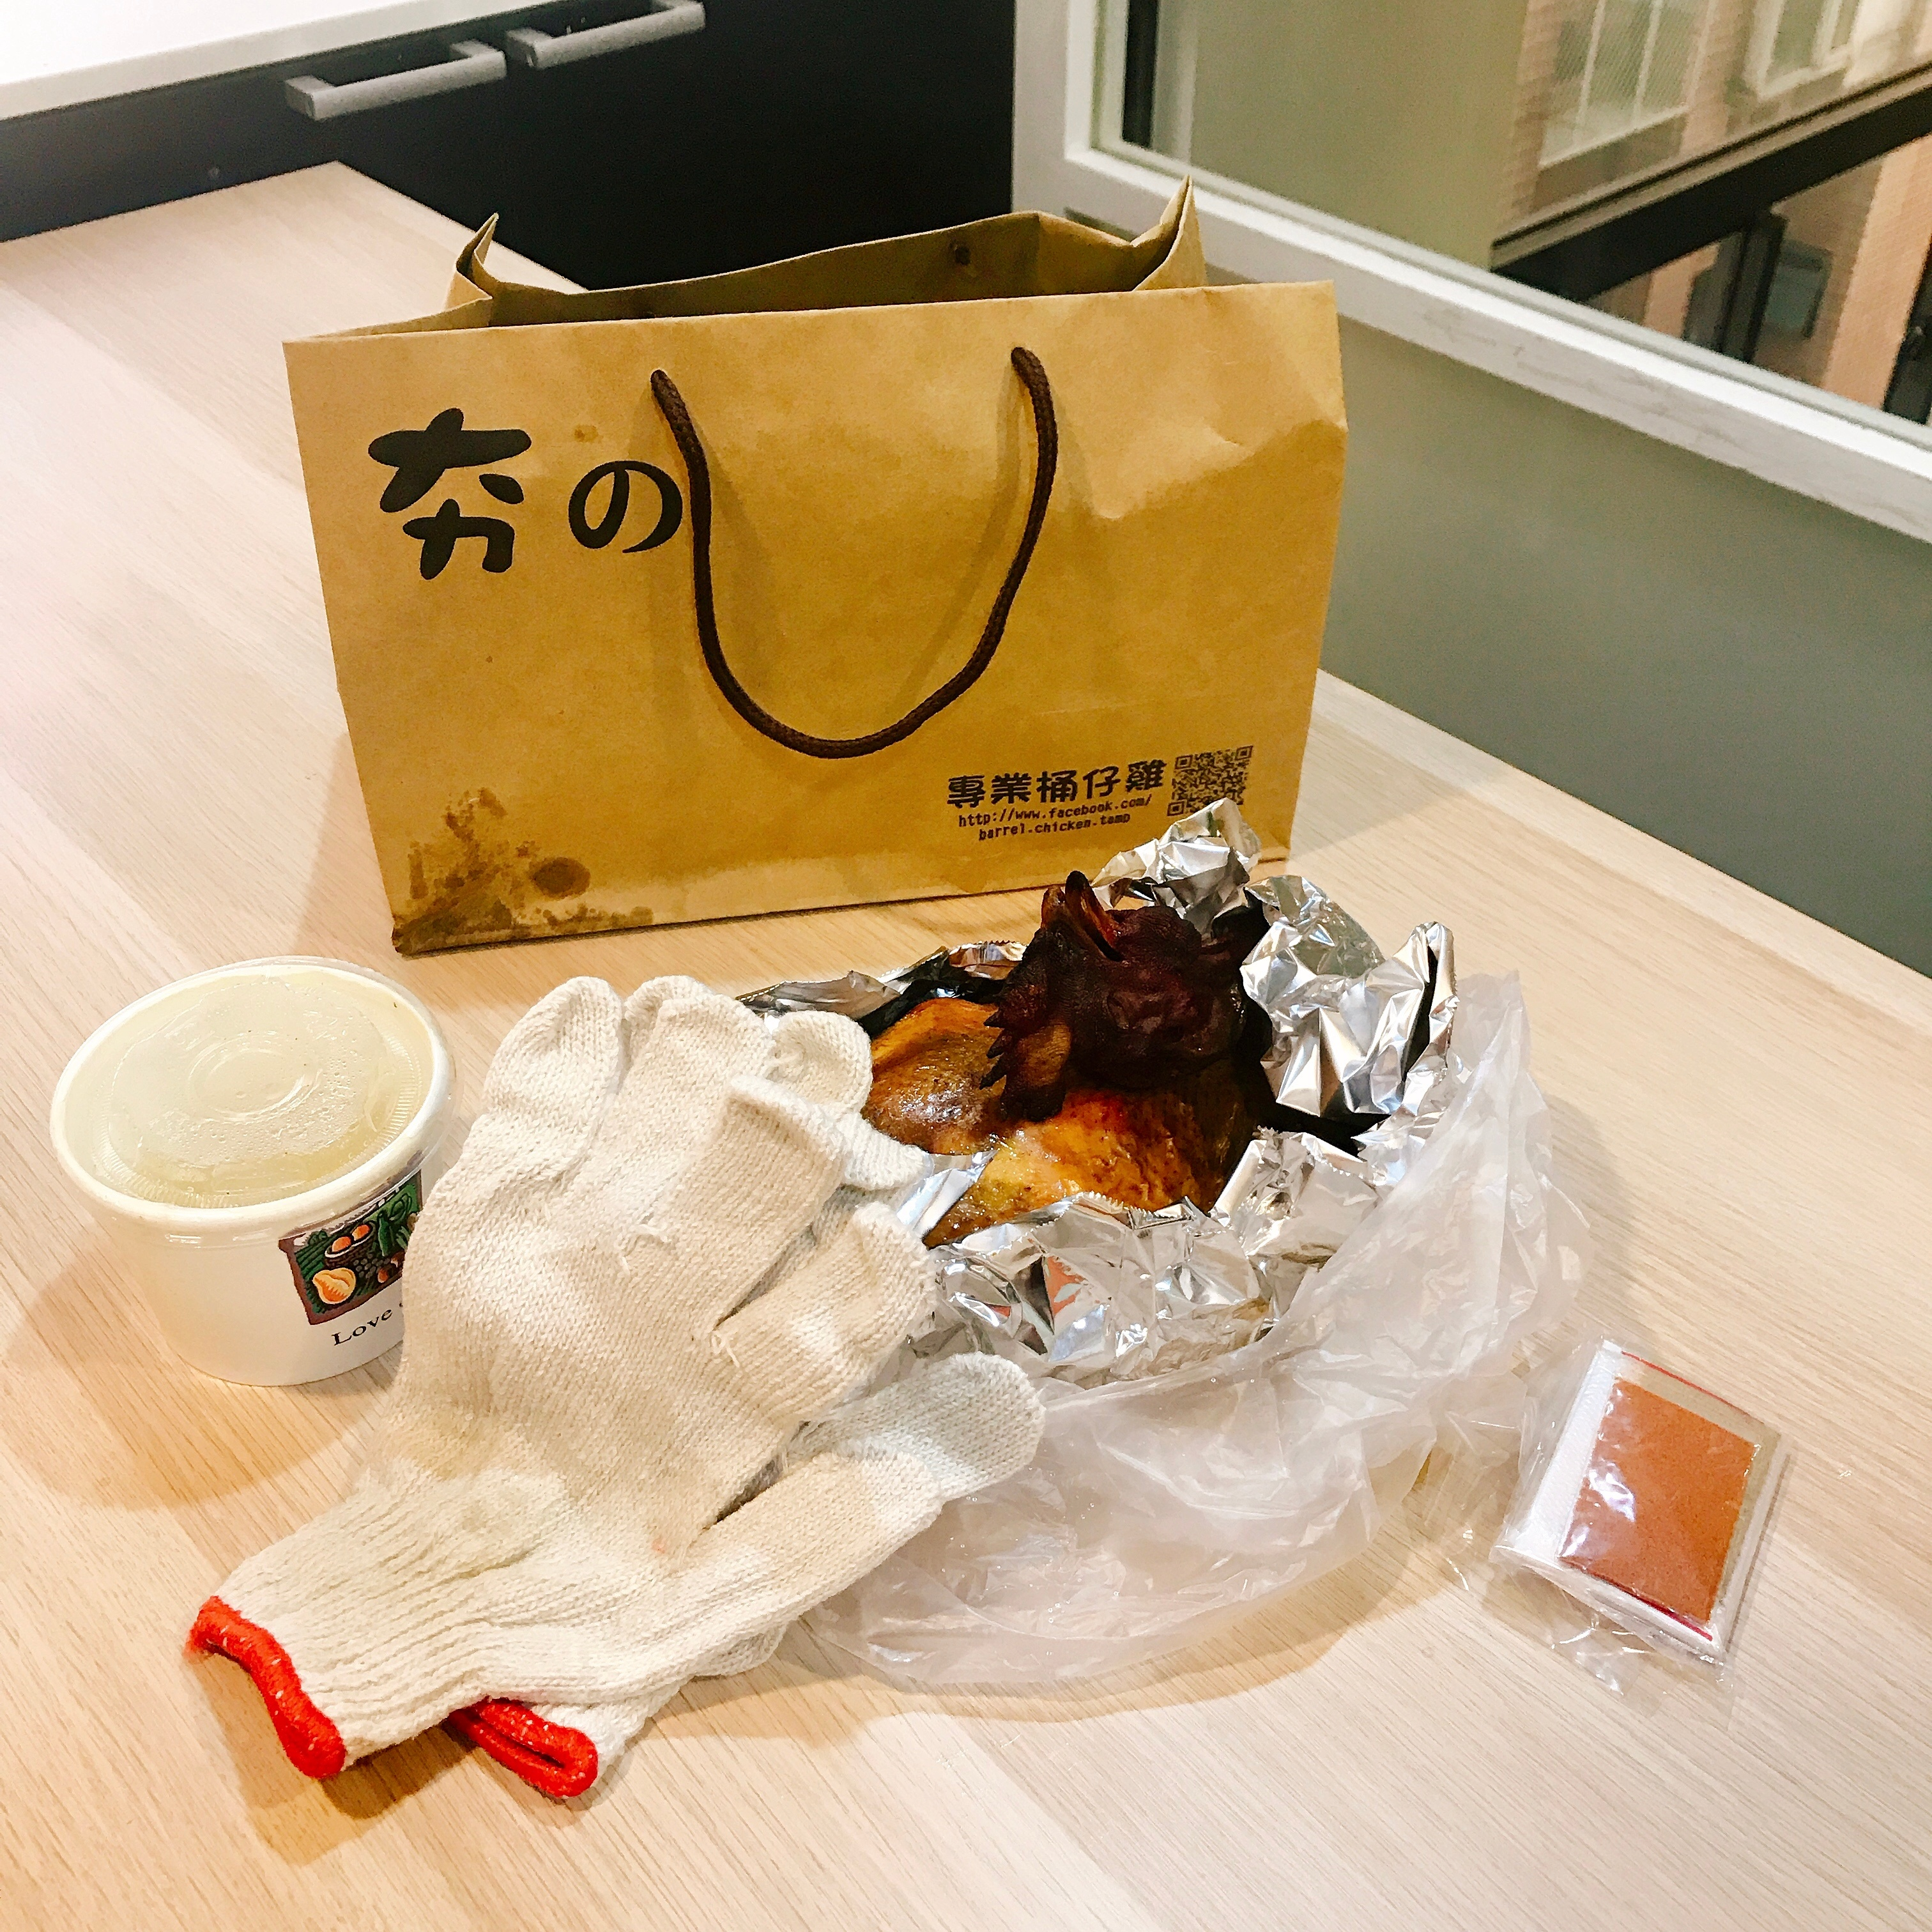 tw_20171128_烤雞3.jpg